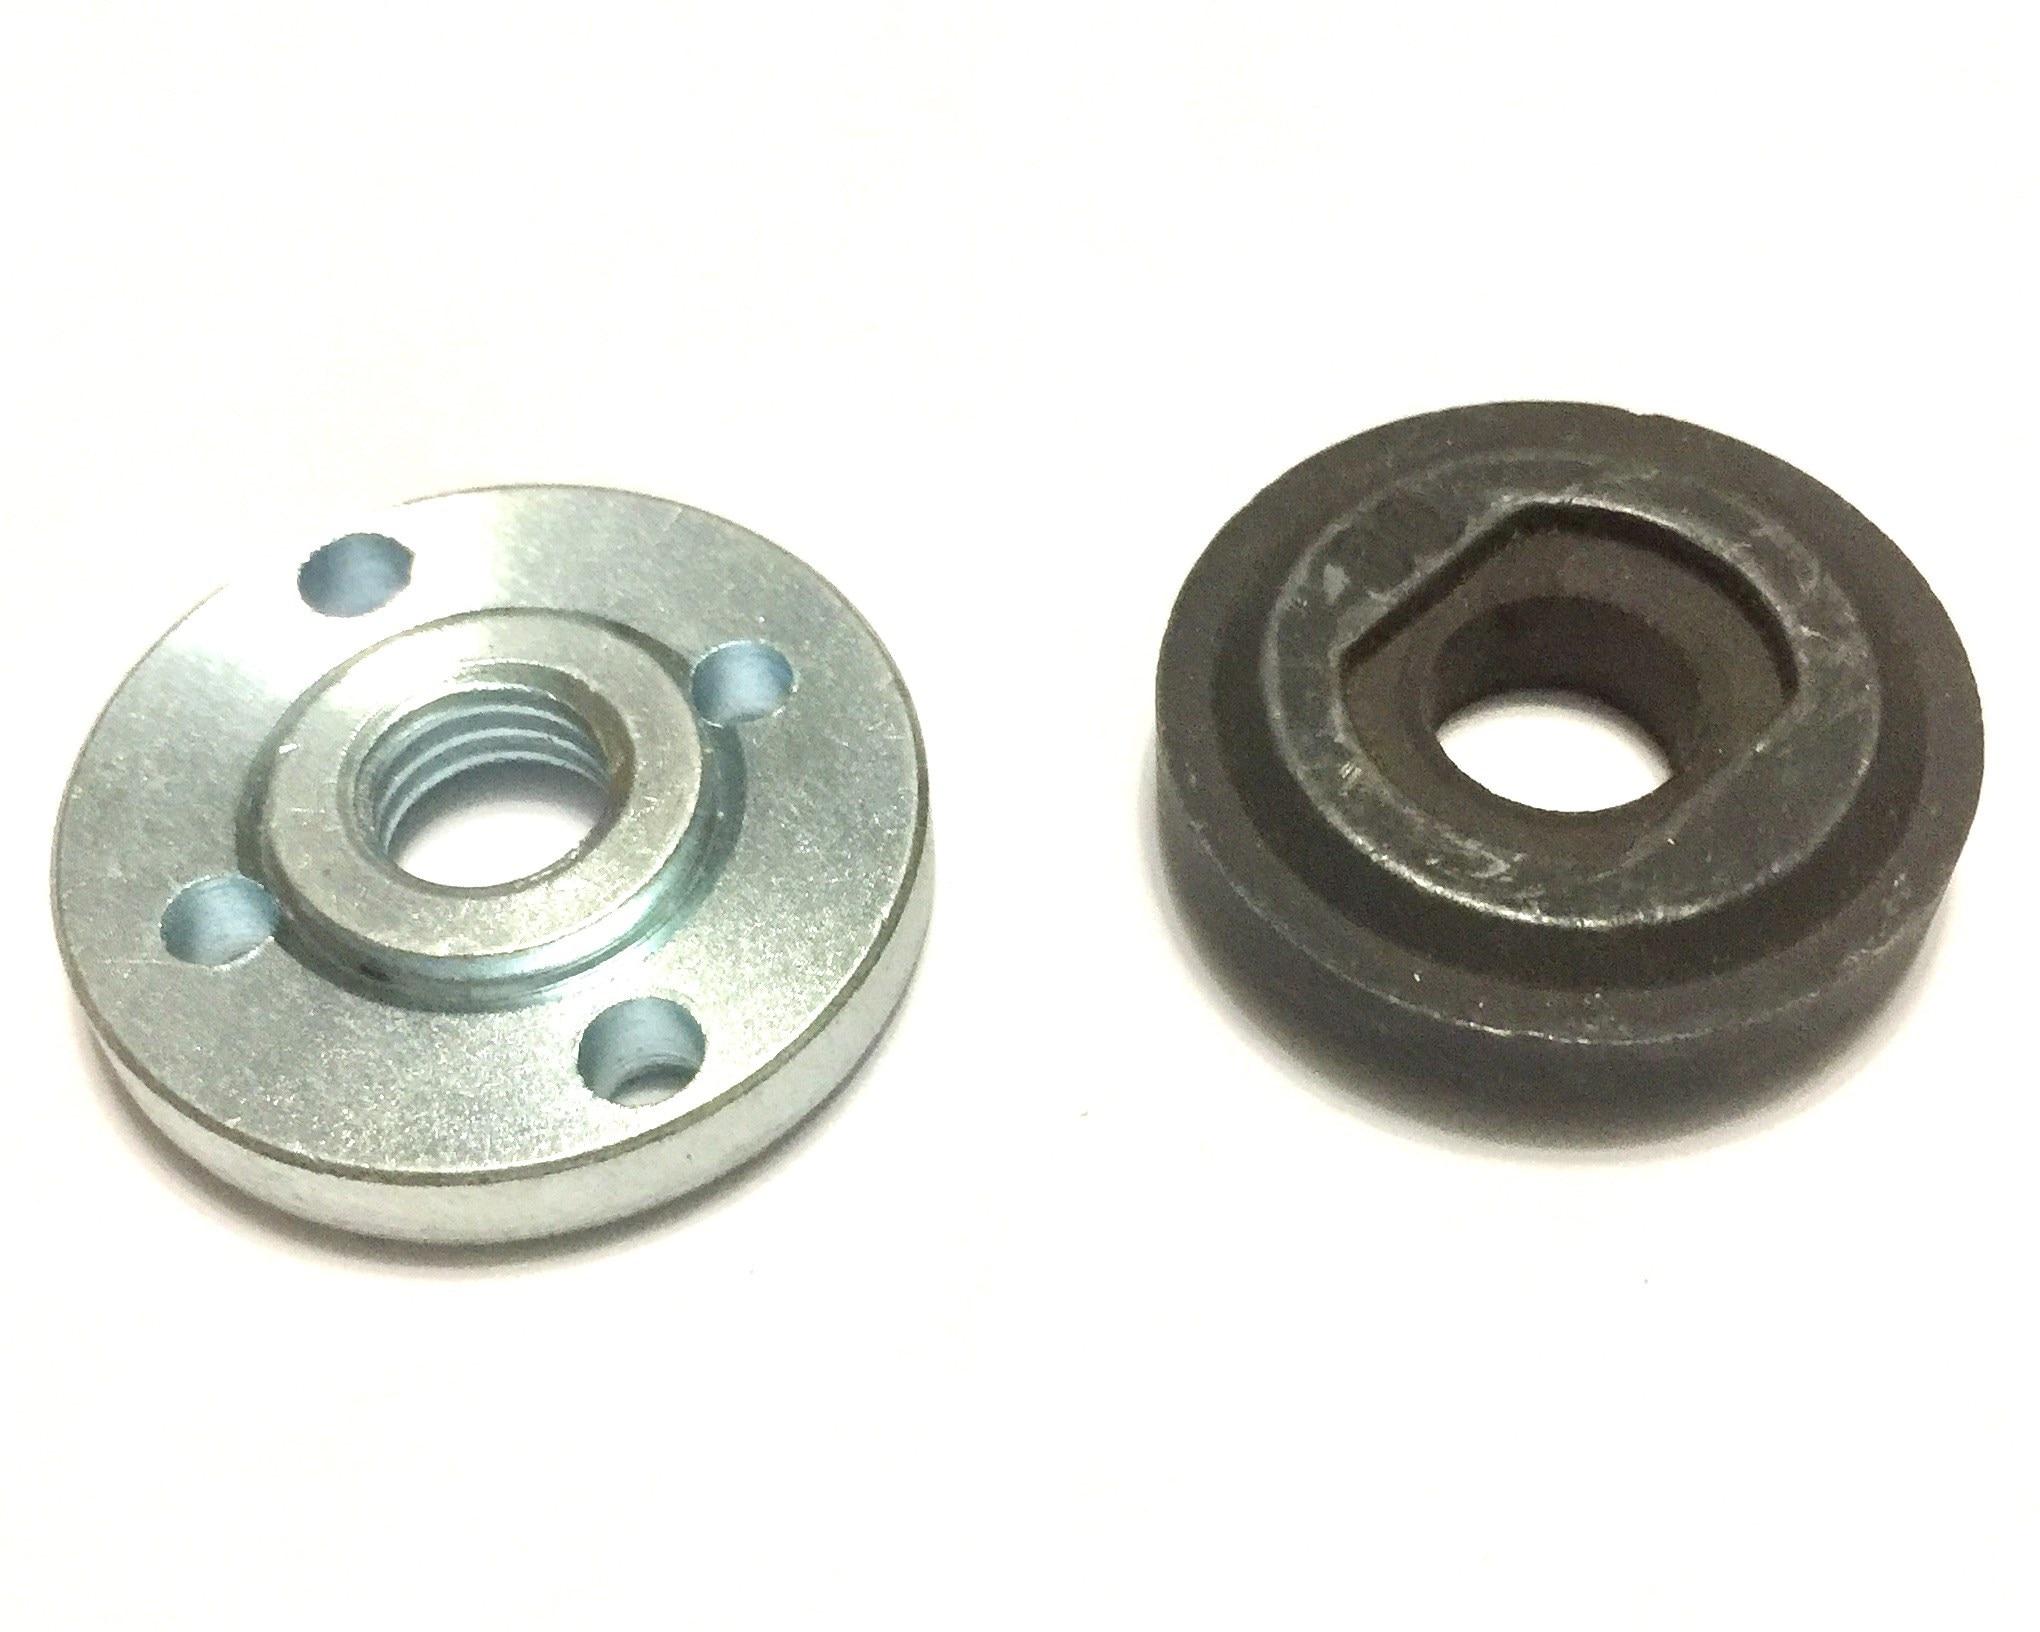 Nut For LBM Bosch (Bosh) 230